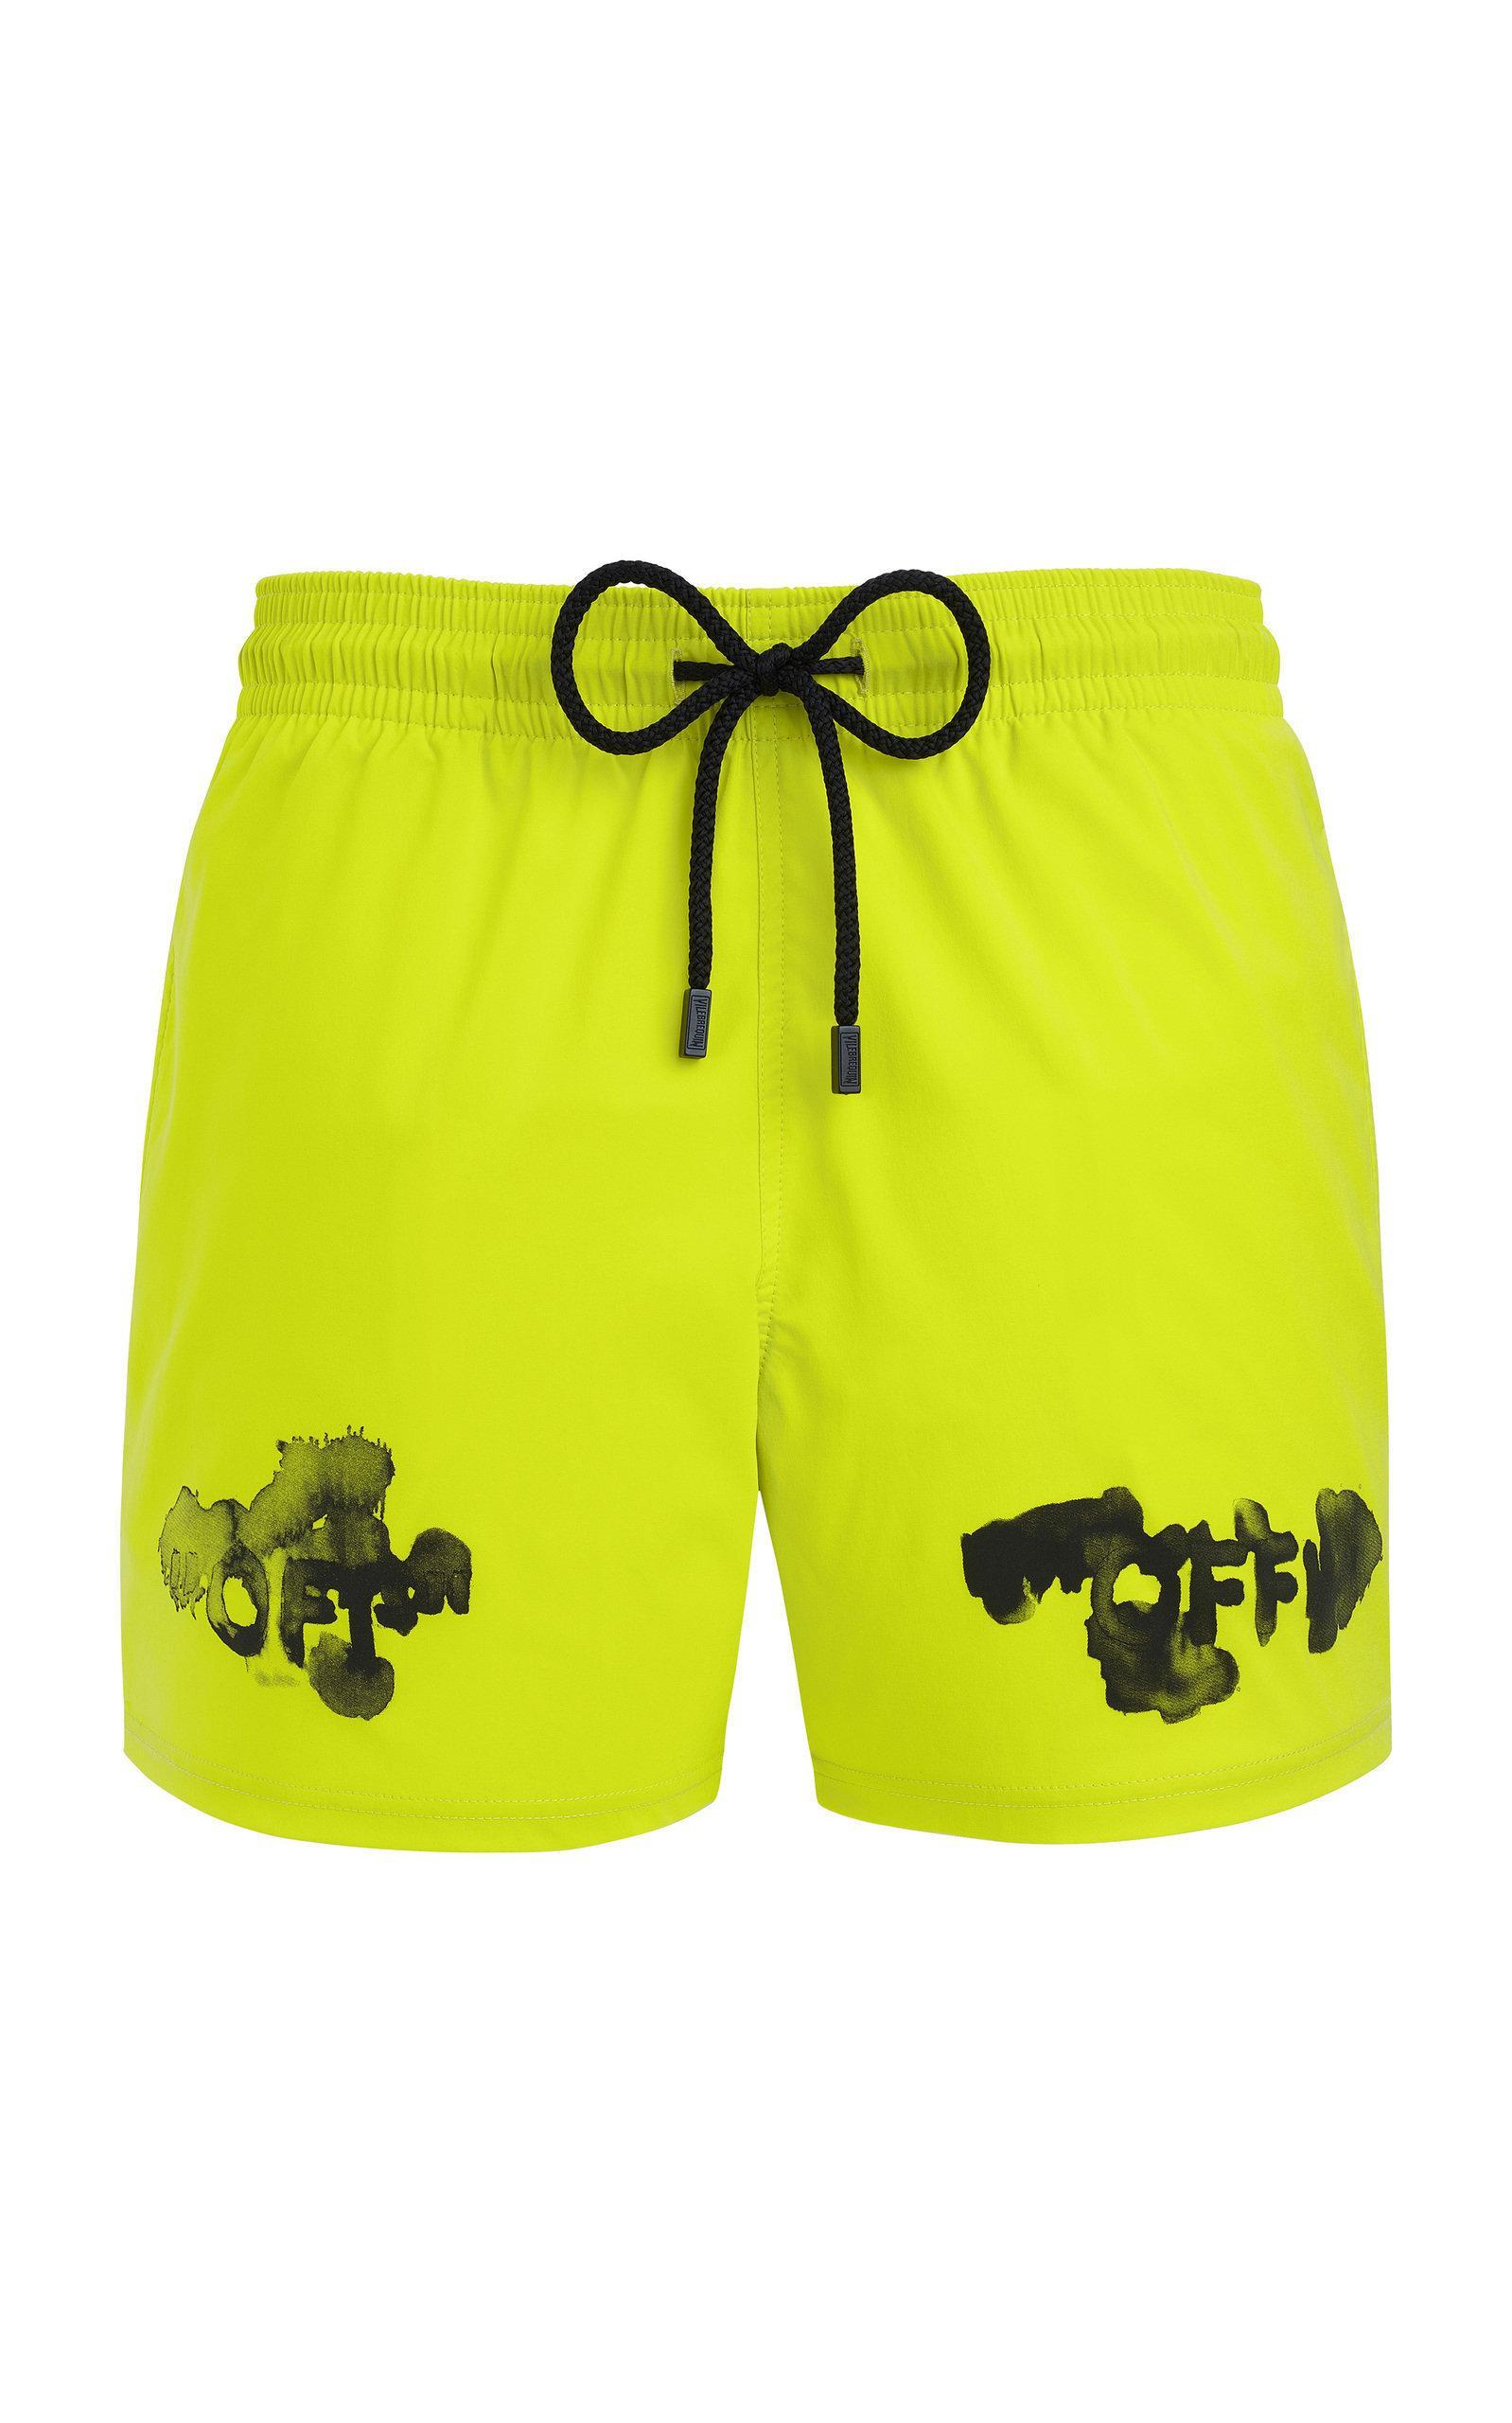 3fd565f84d Off-White c/o Virgil Abloh. Men's Yellow Vilebrequin Edition Moorise Swim  Shorts